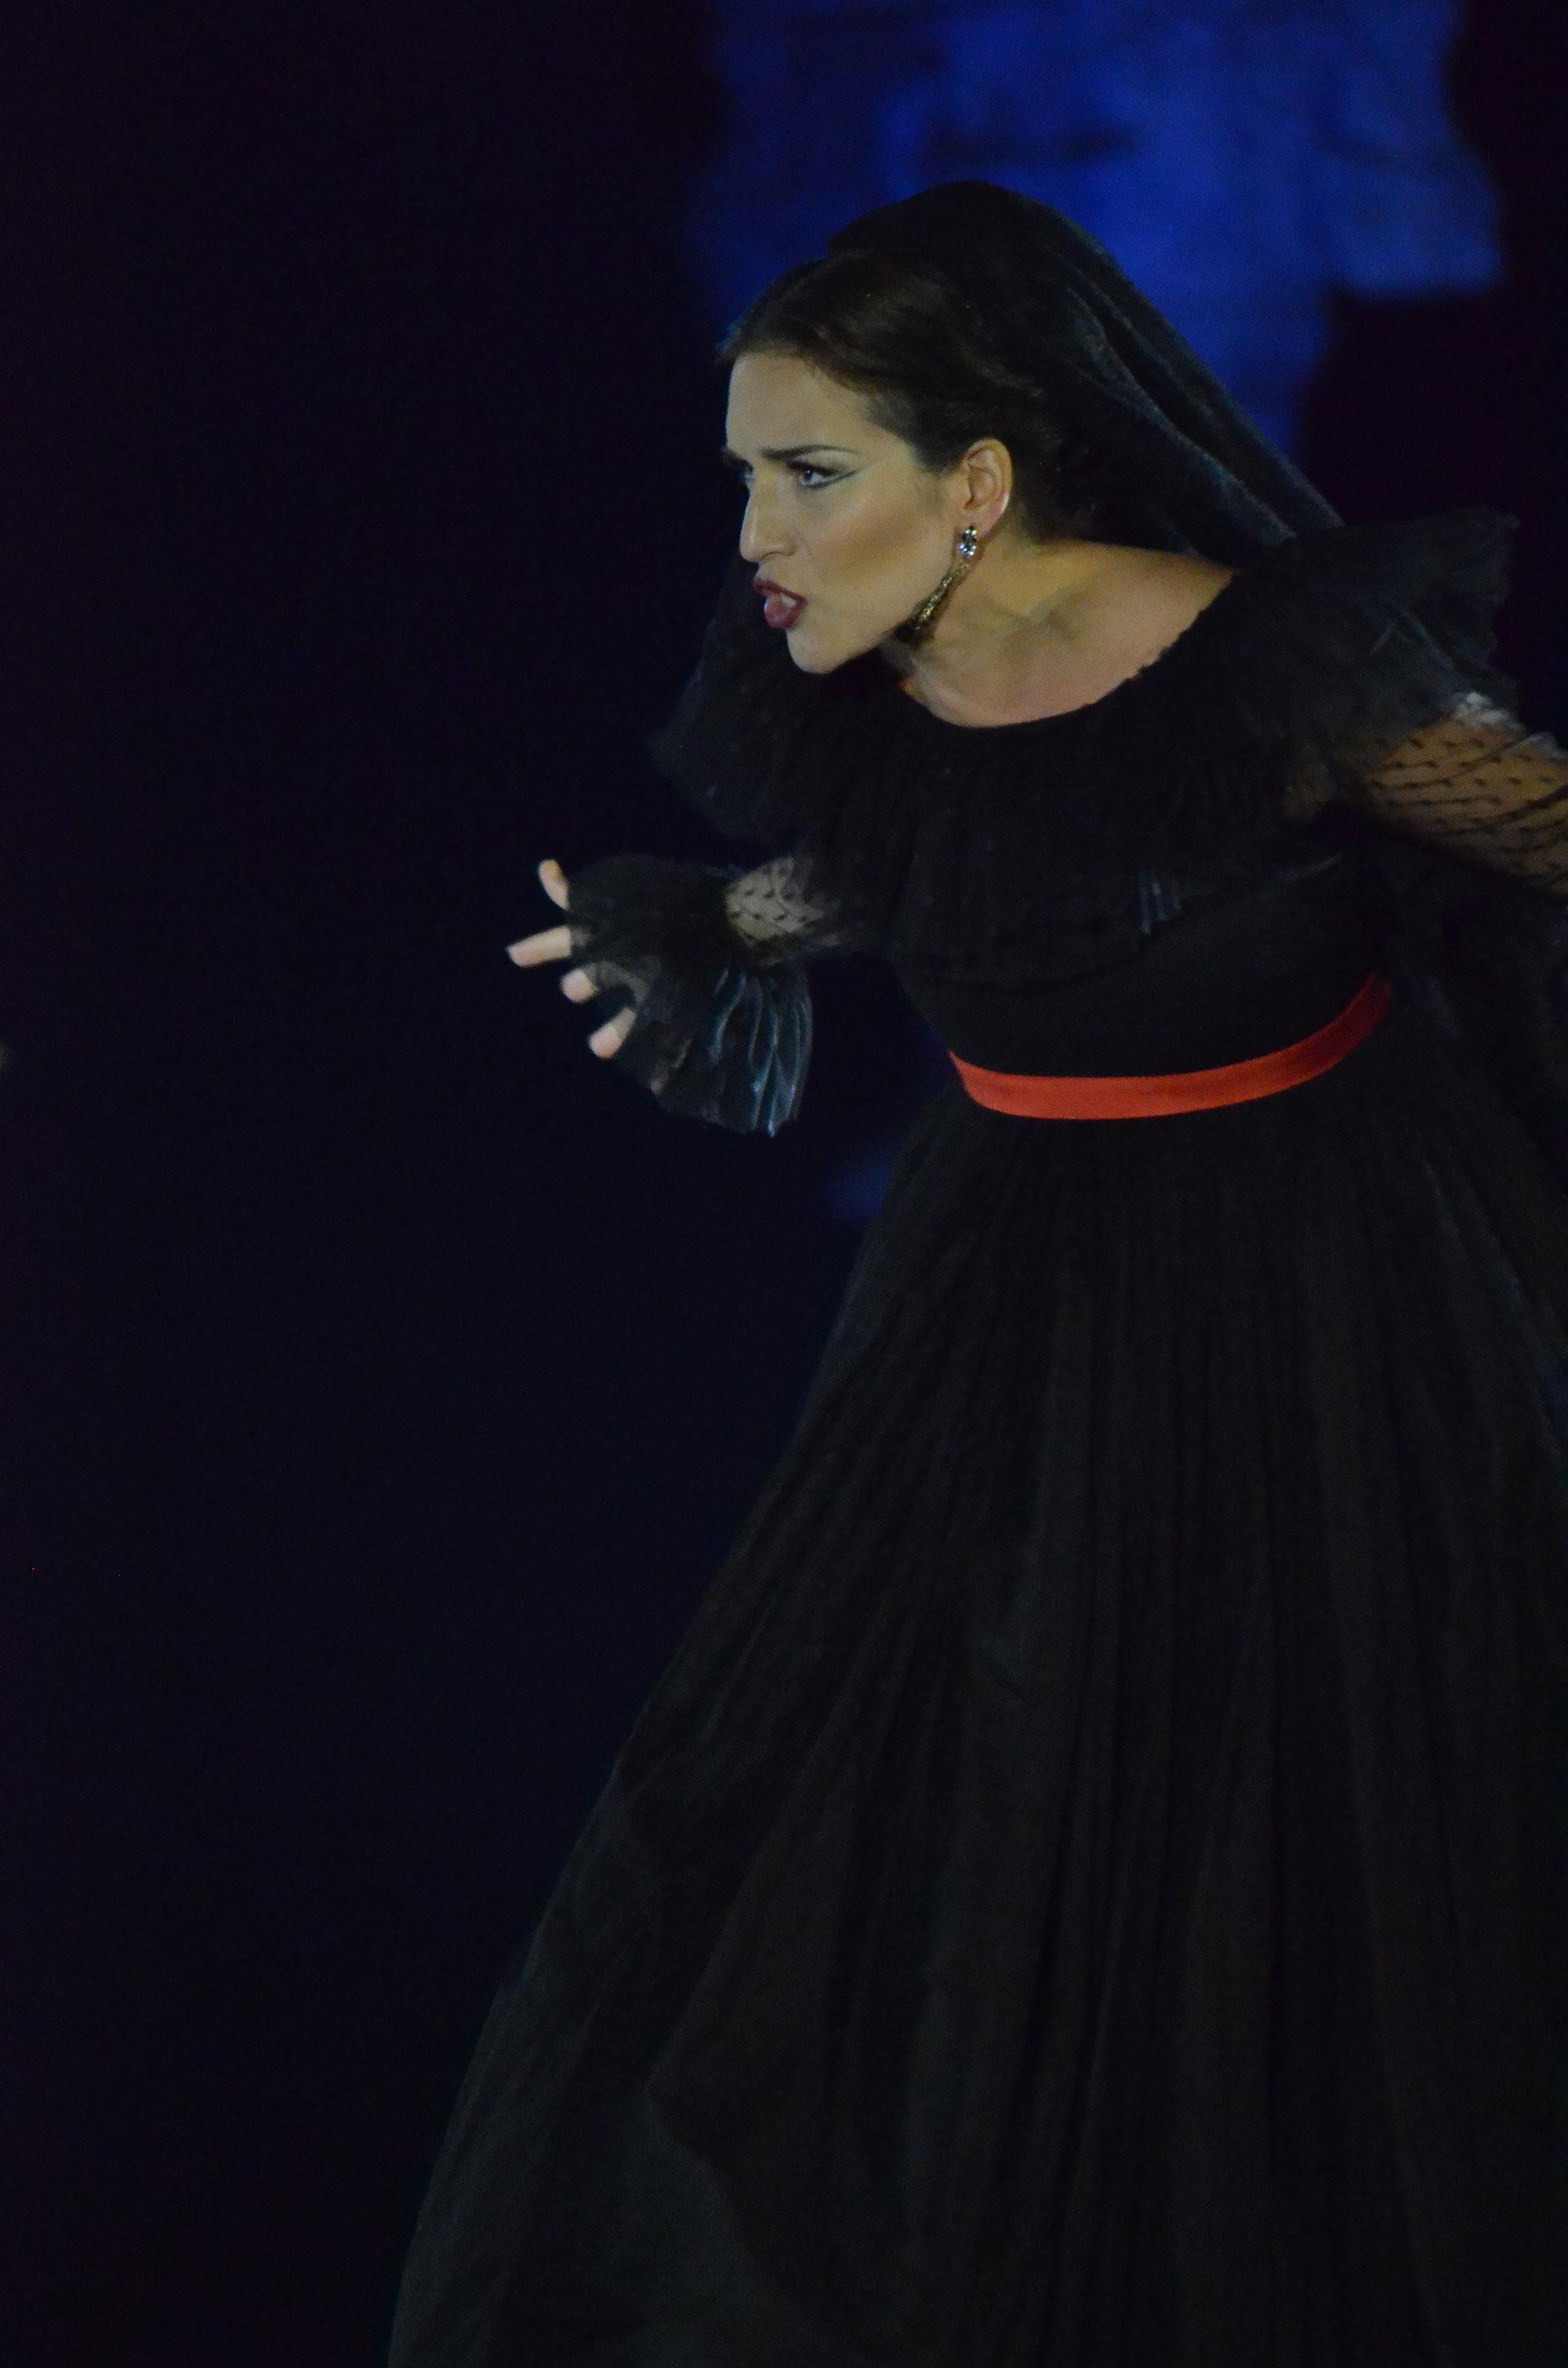 donna-anna-fabienne-conrad-01